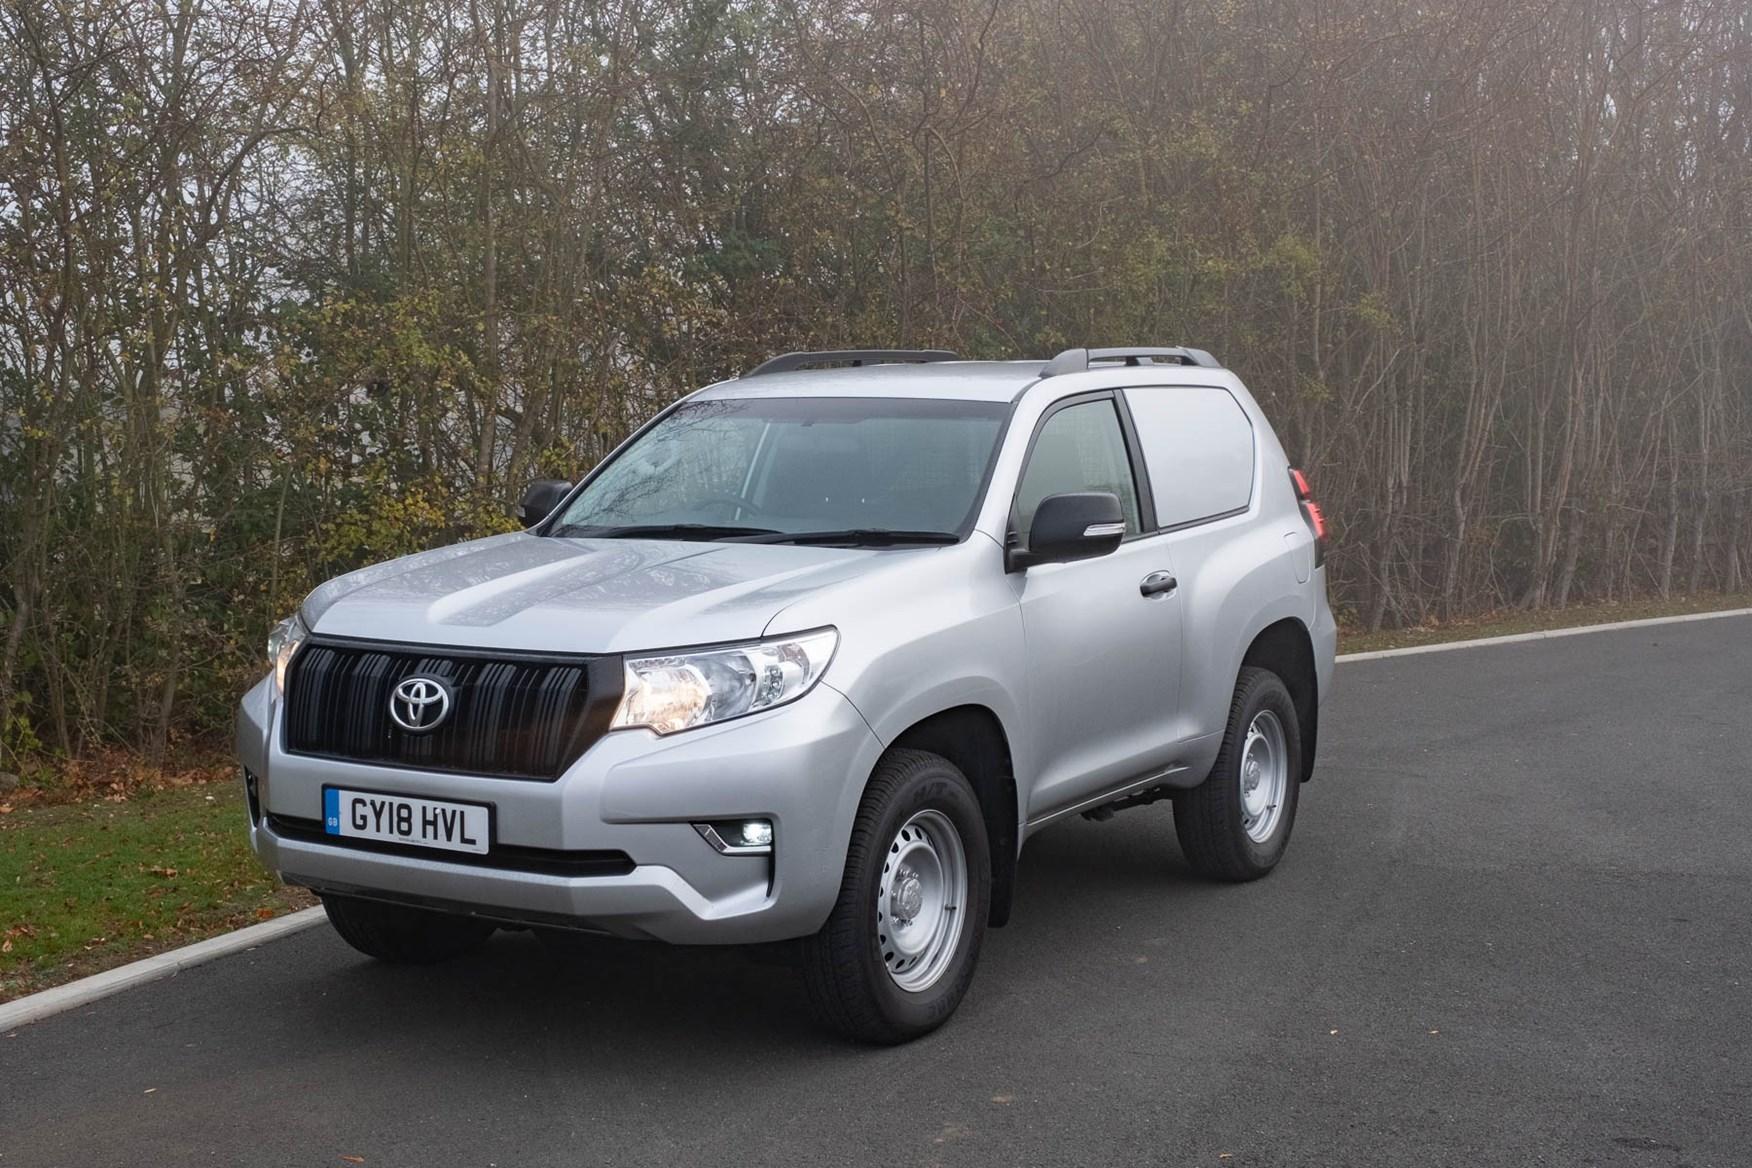 Toyota Land Cruiser Utility - SWB - side